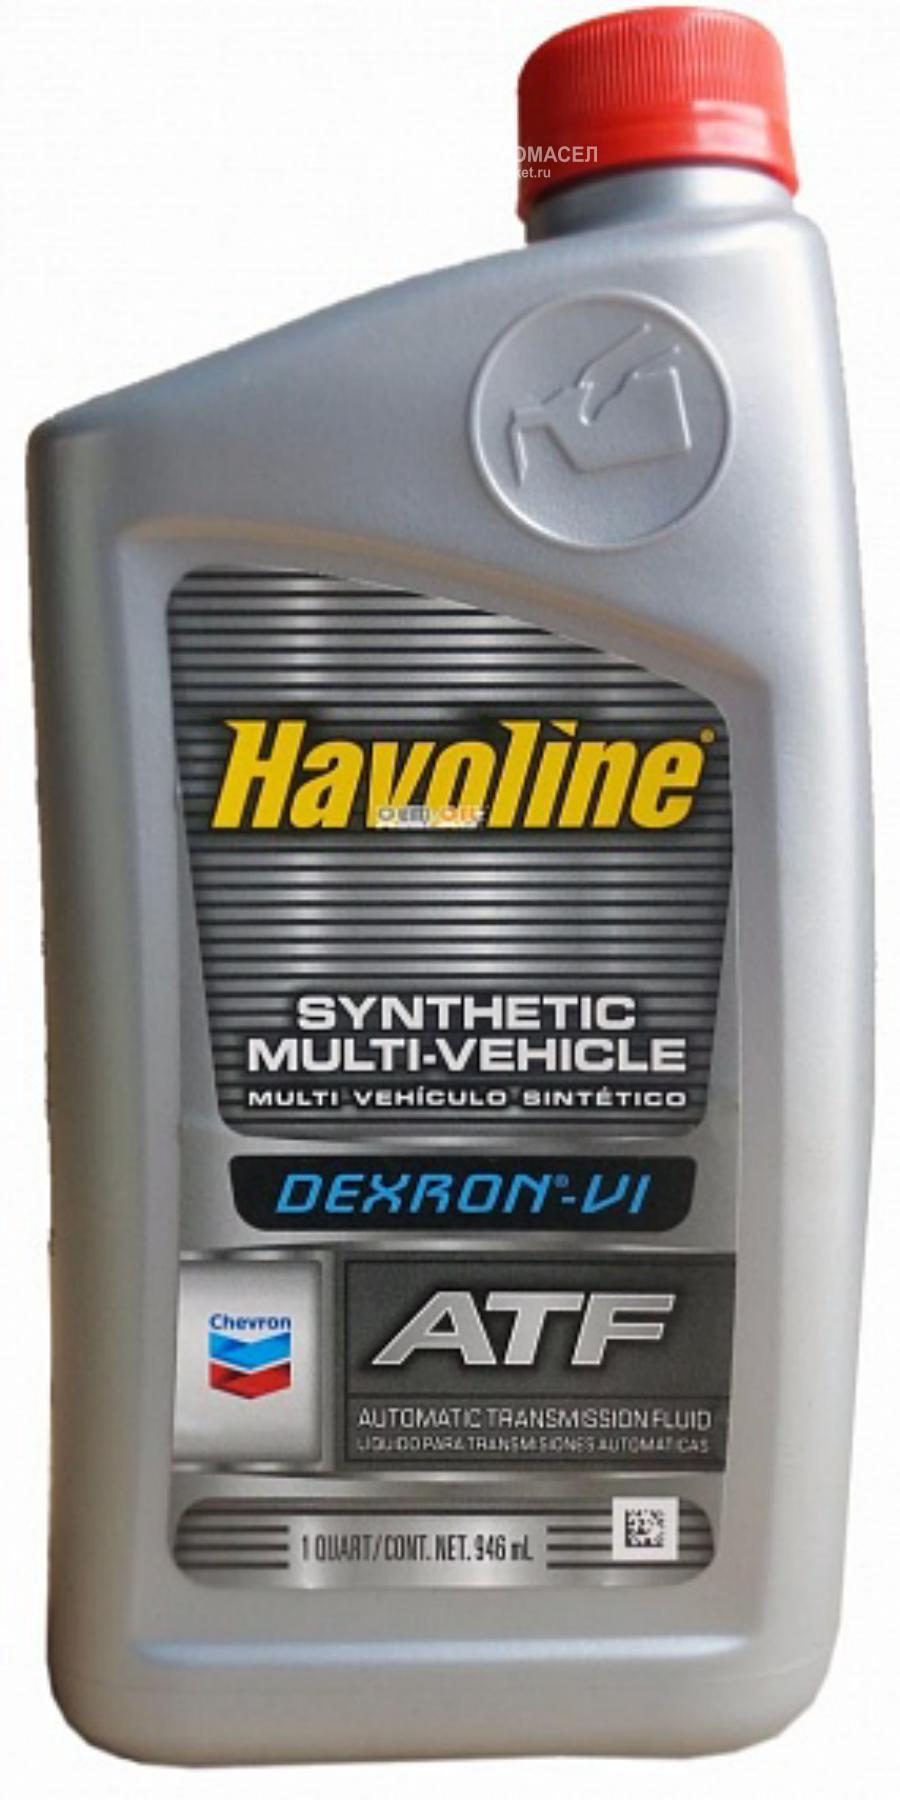 CHEVRON Havoline Synthetic ATF Multi-Vehicle Dexron-VI